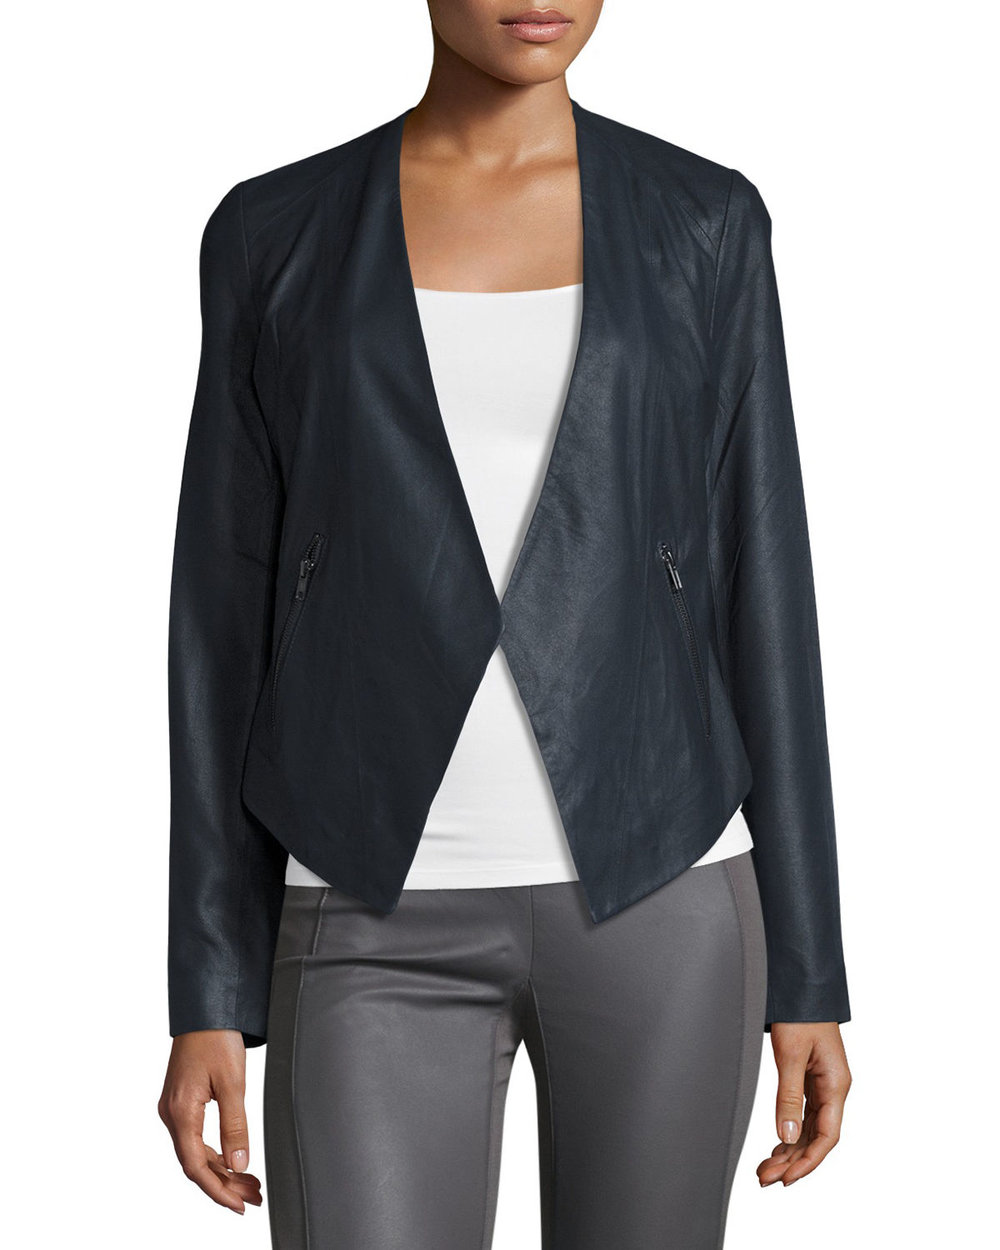 My Tribe Peaked-Hem Leather Blazer, Ink. Nieman Marcus Last Call. Was: $299. Now: $119.